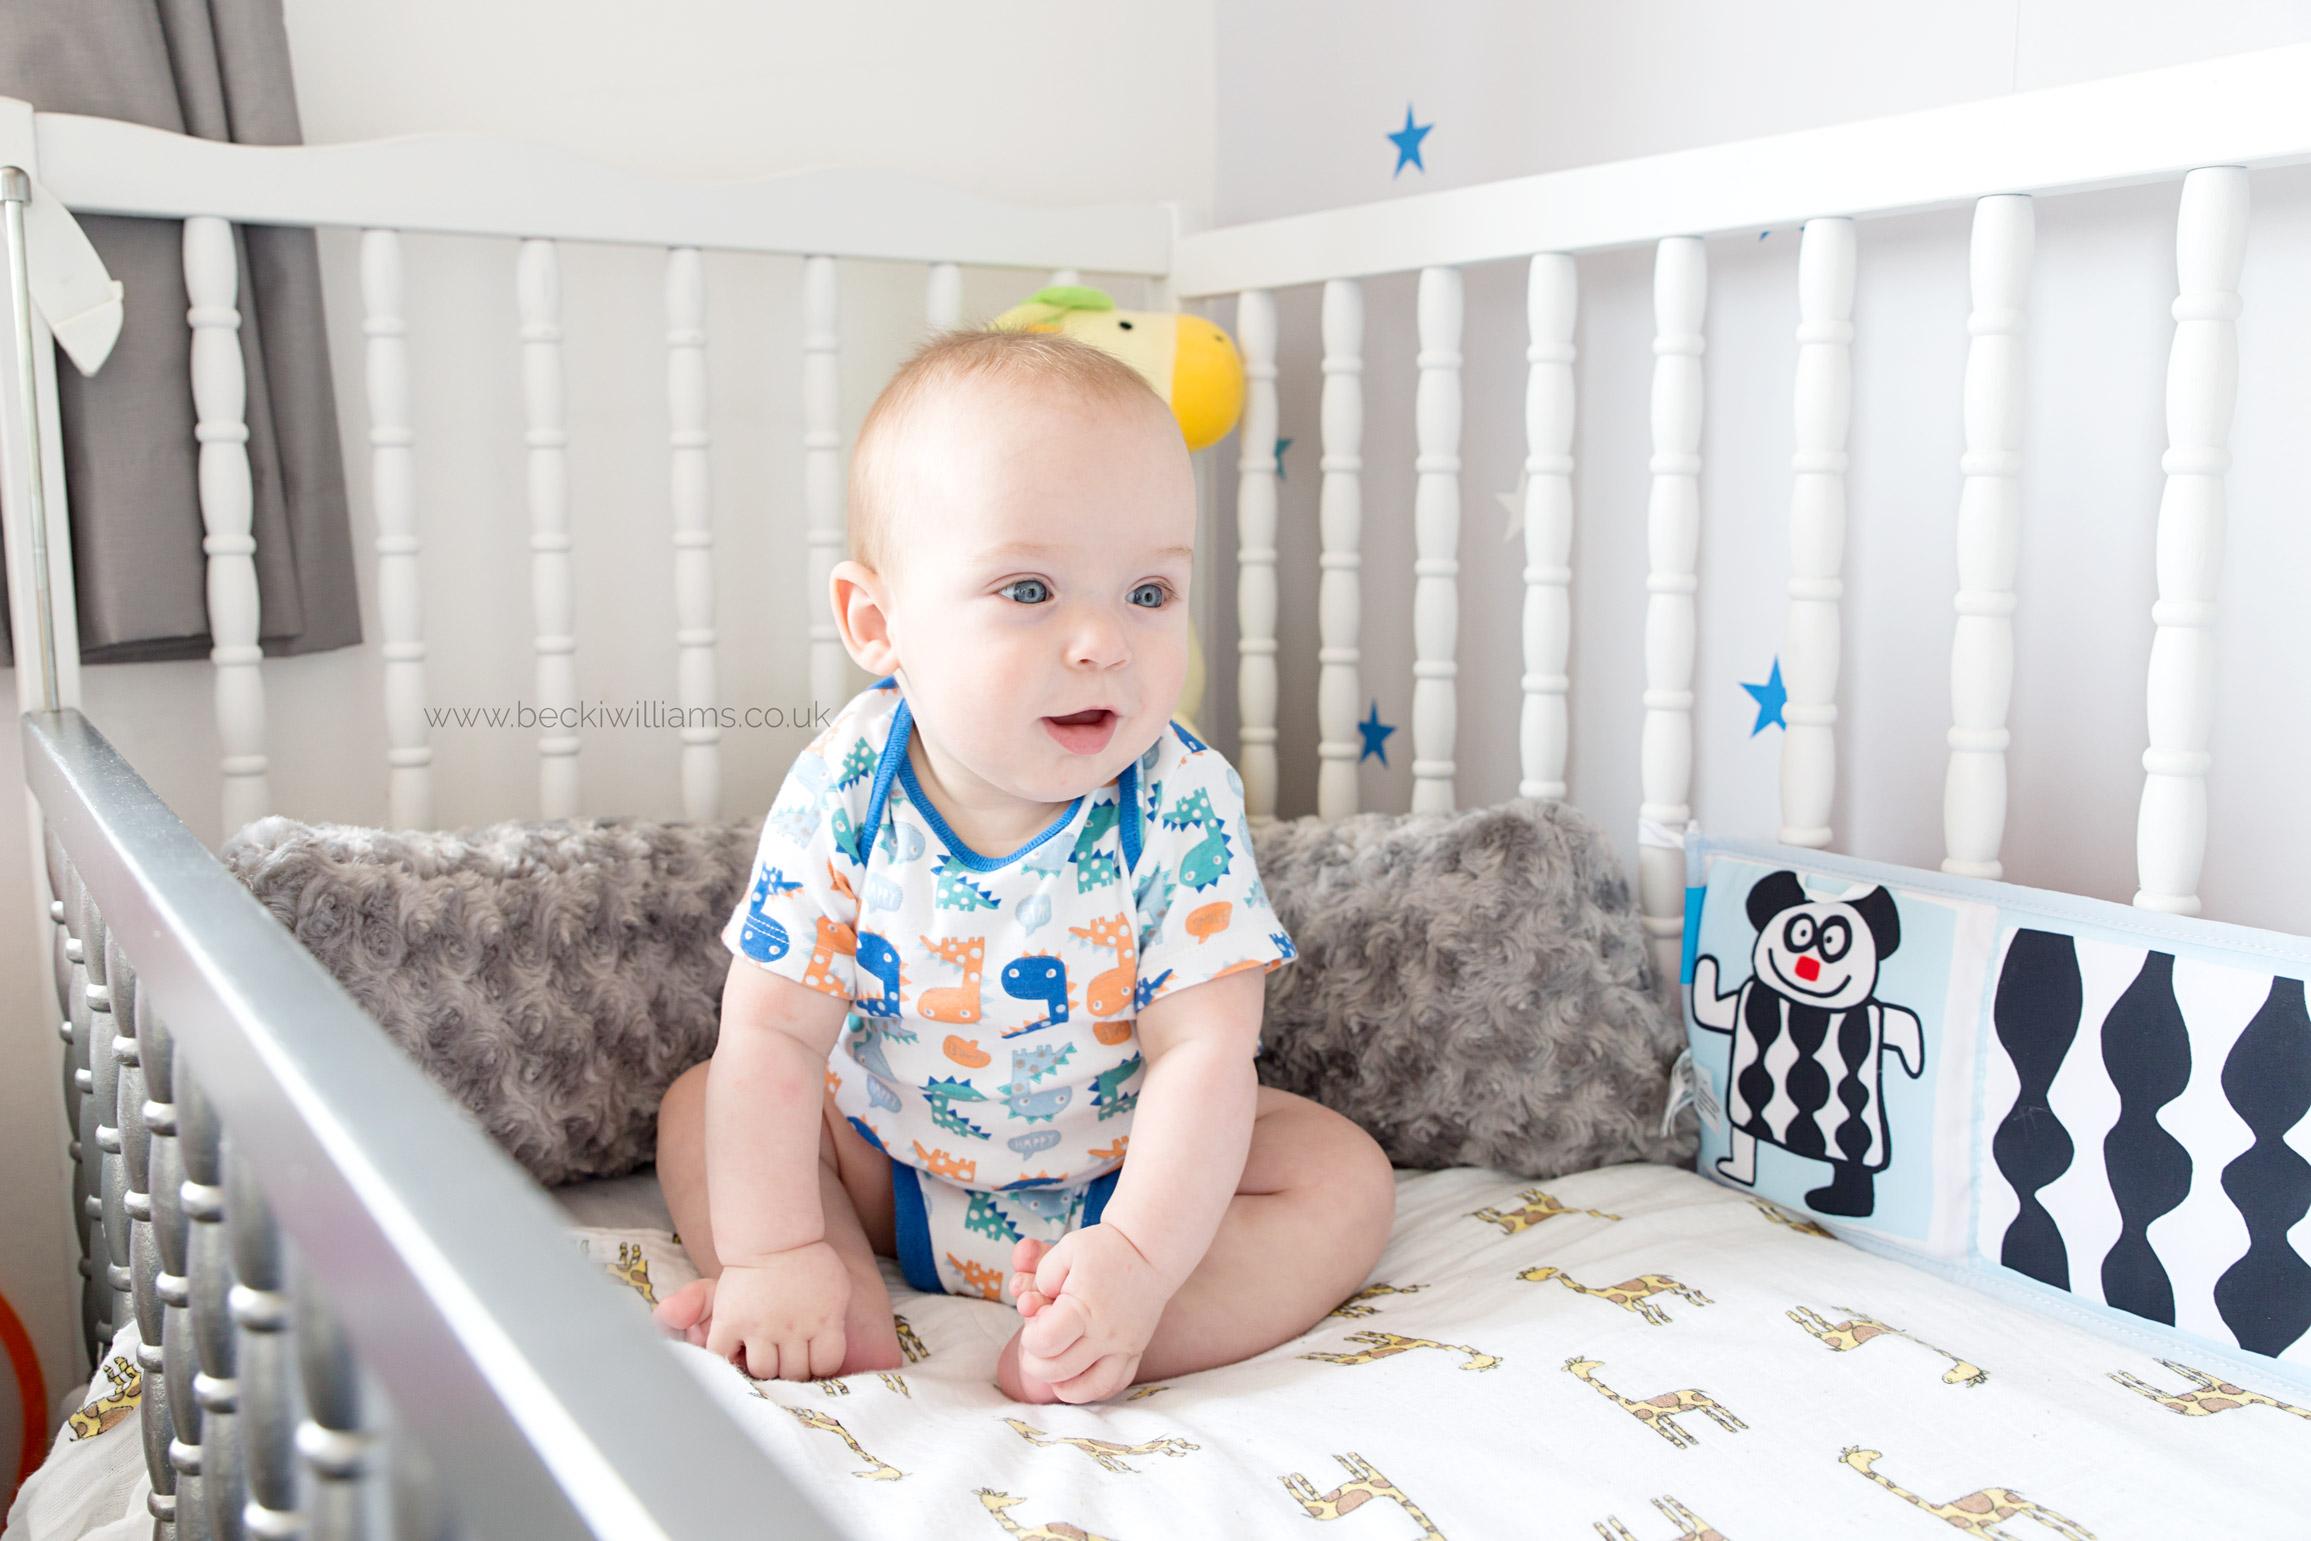 Baby-photography-hemel-hempstead-baby-sitting-in-cot